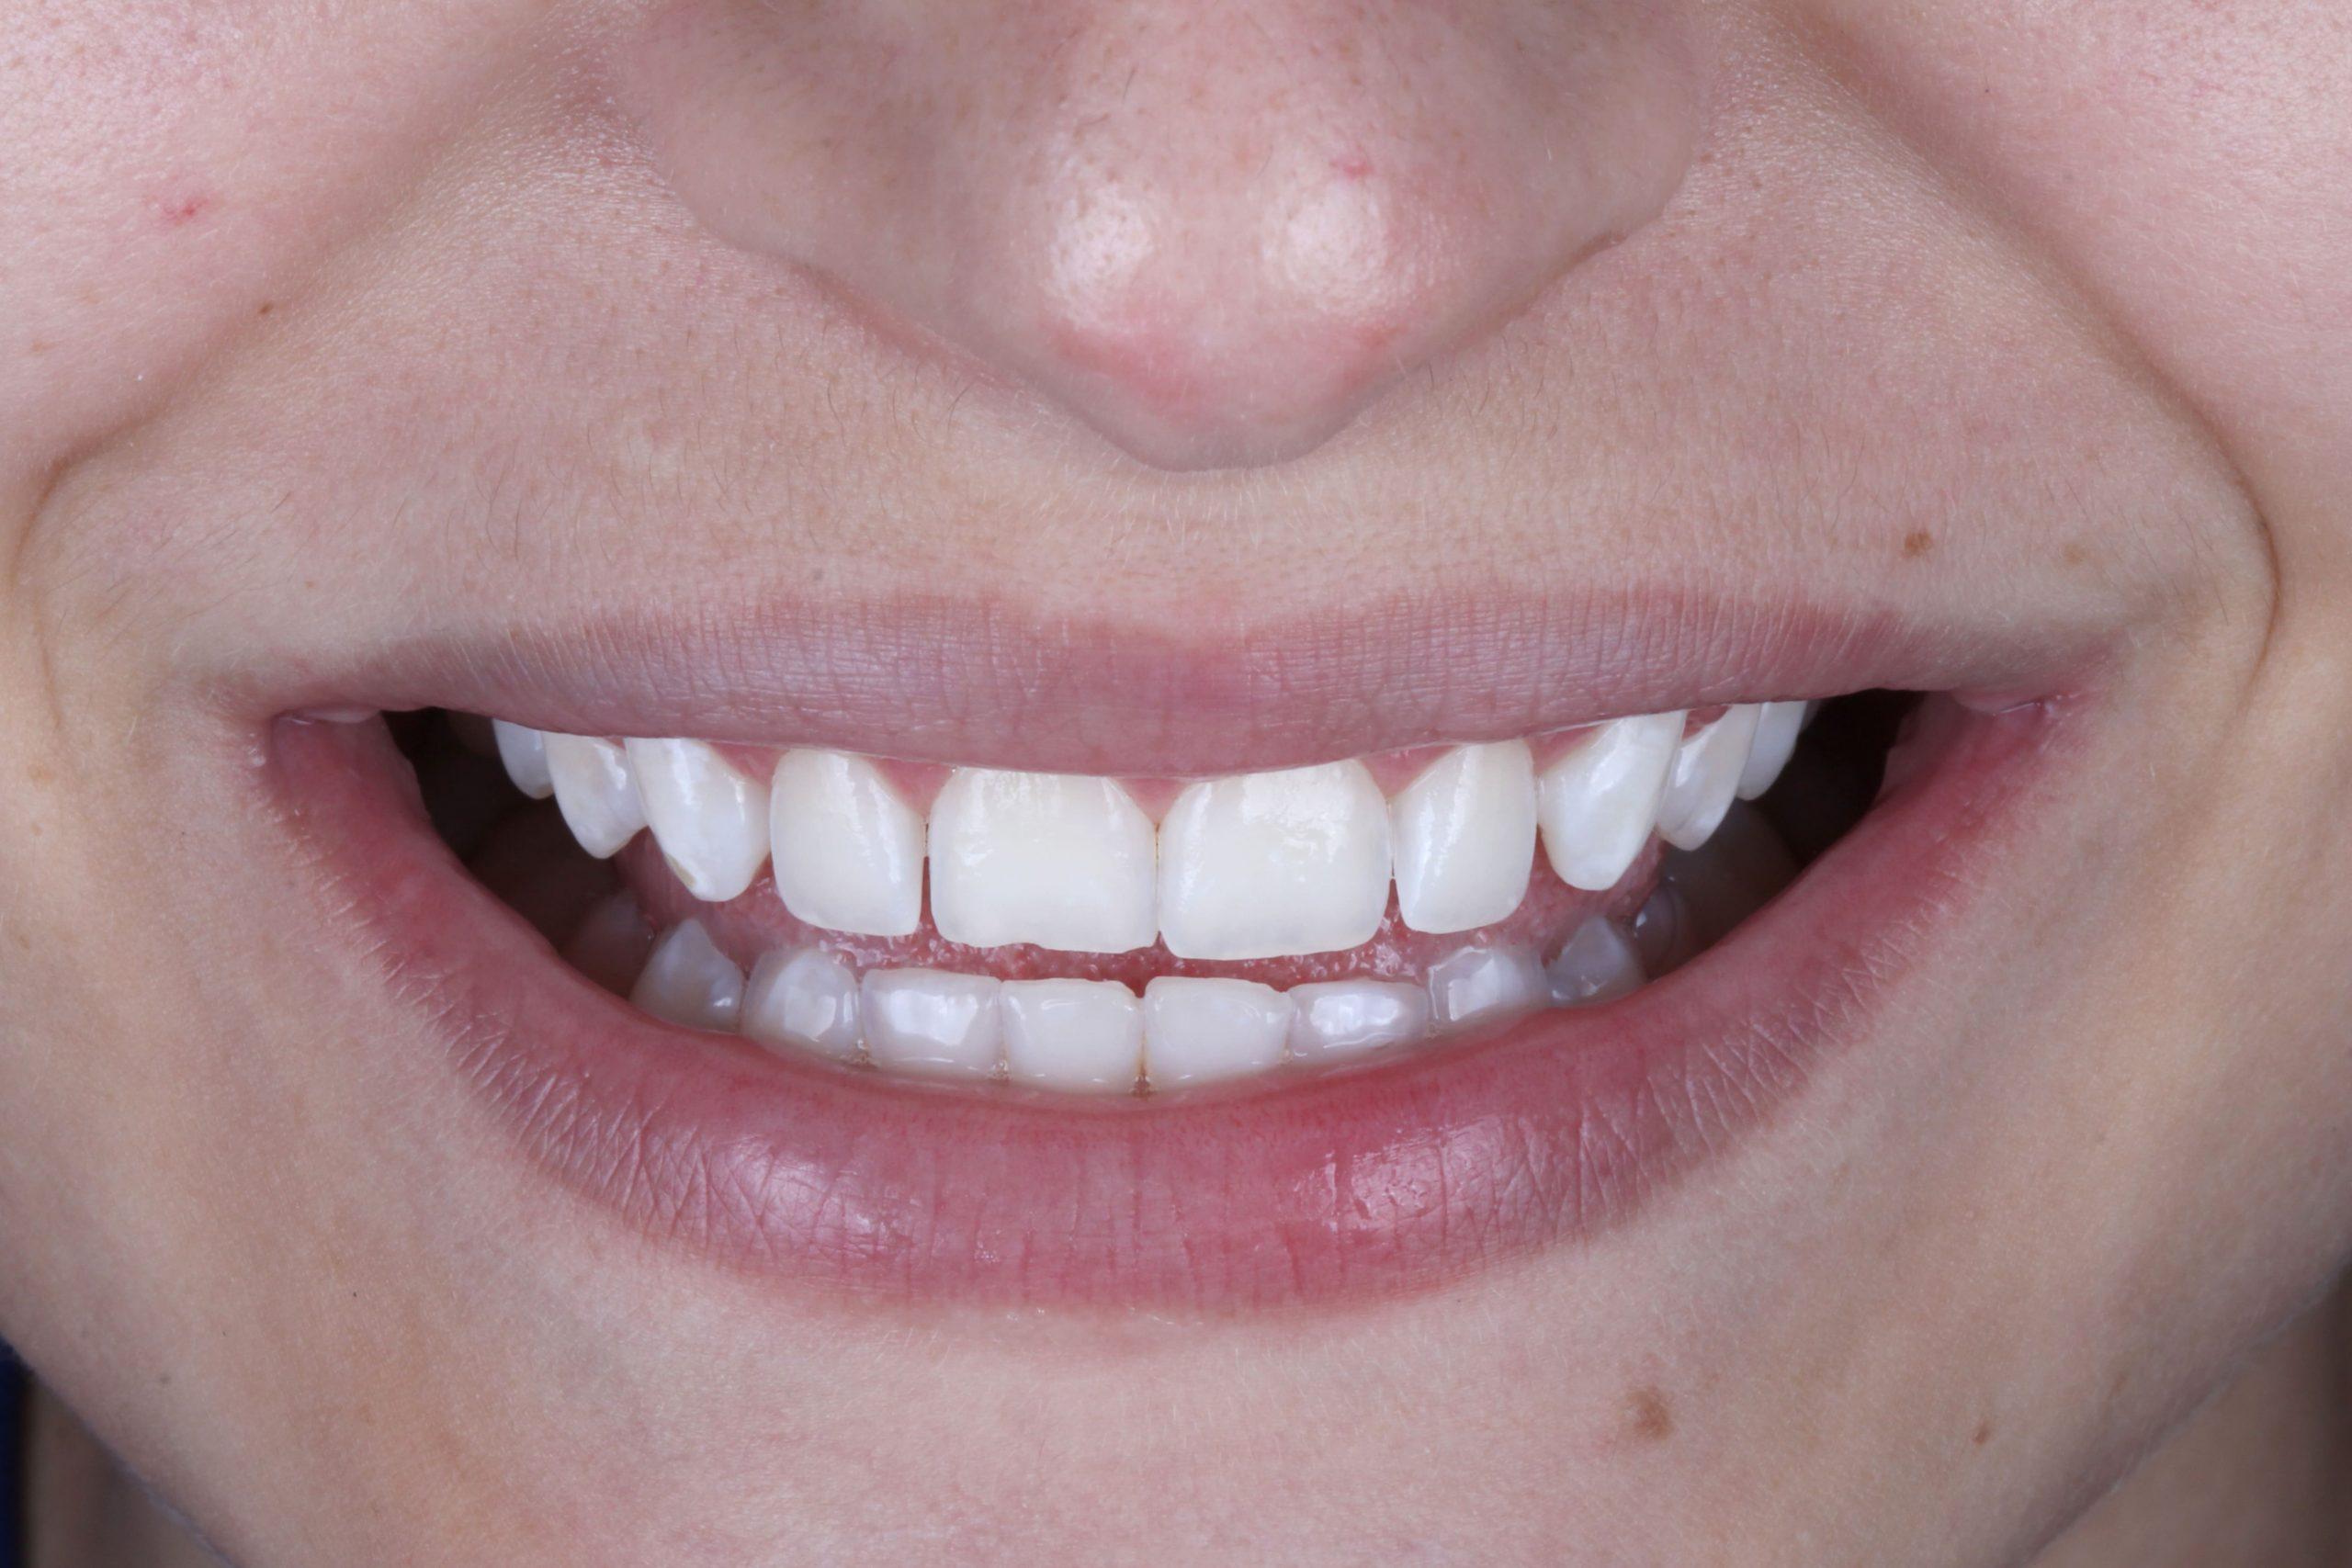 sorriso final da paciente sem a fluorose dental